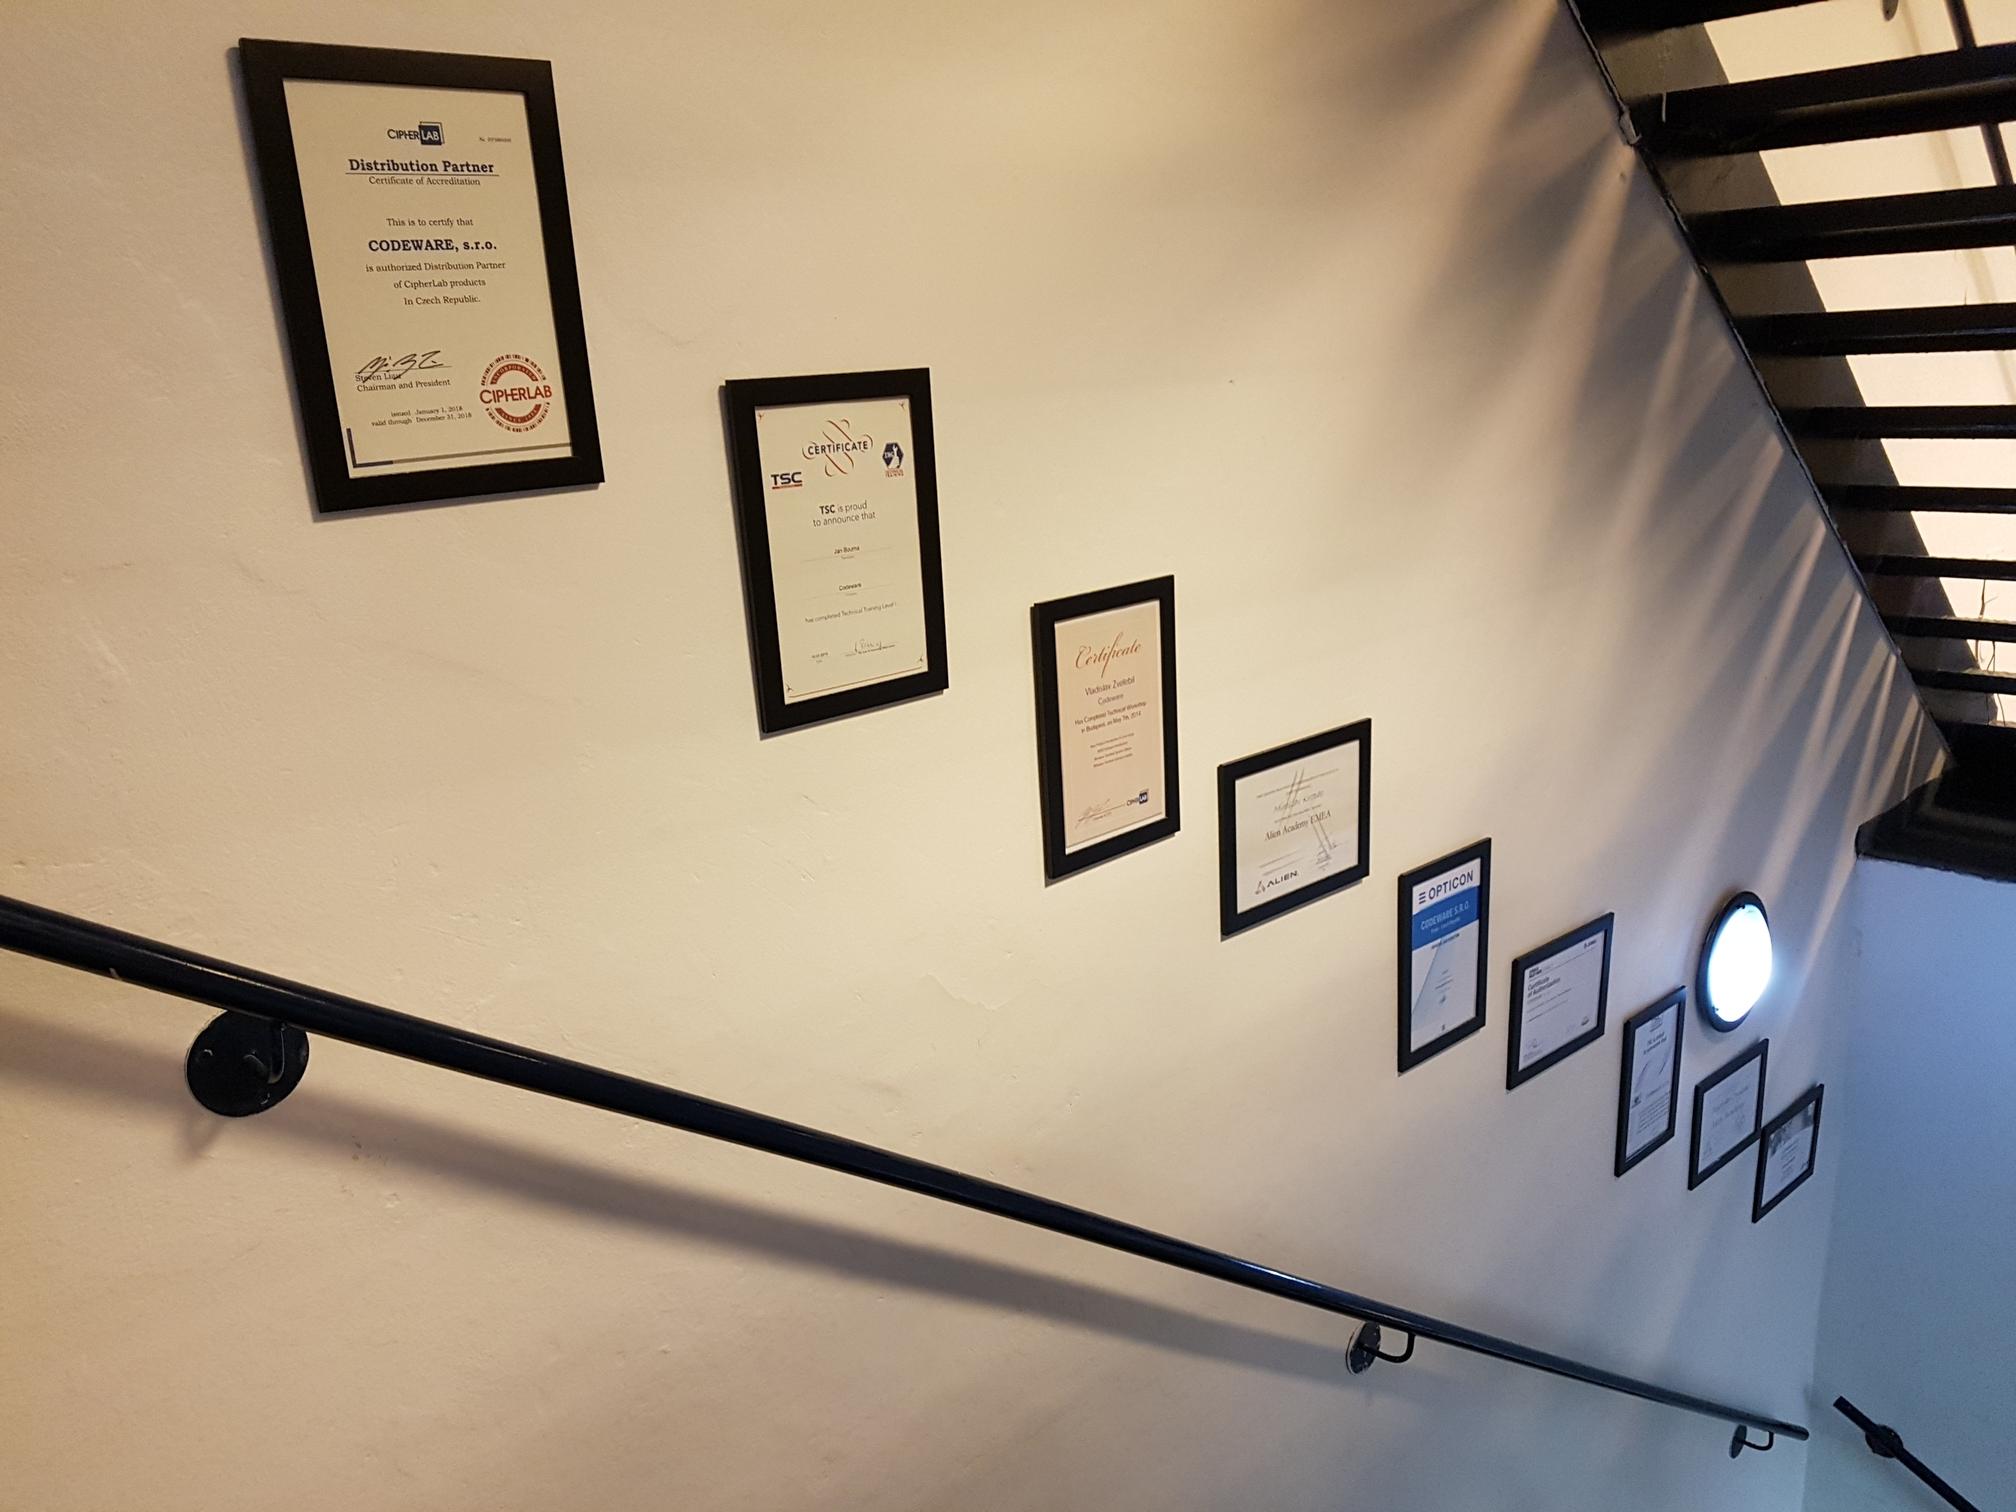 CODEWARE_certifications